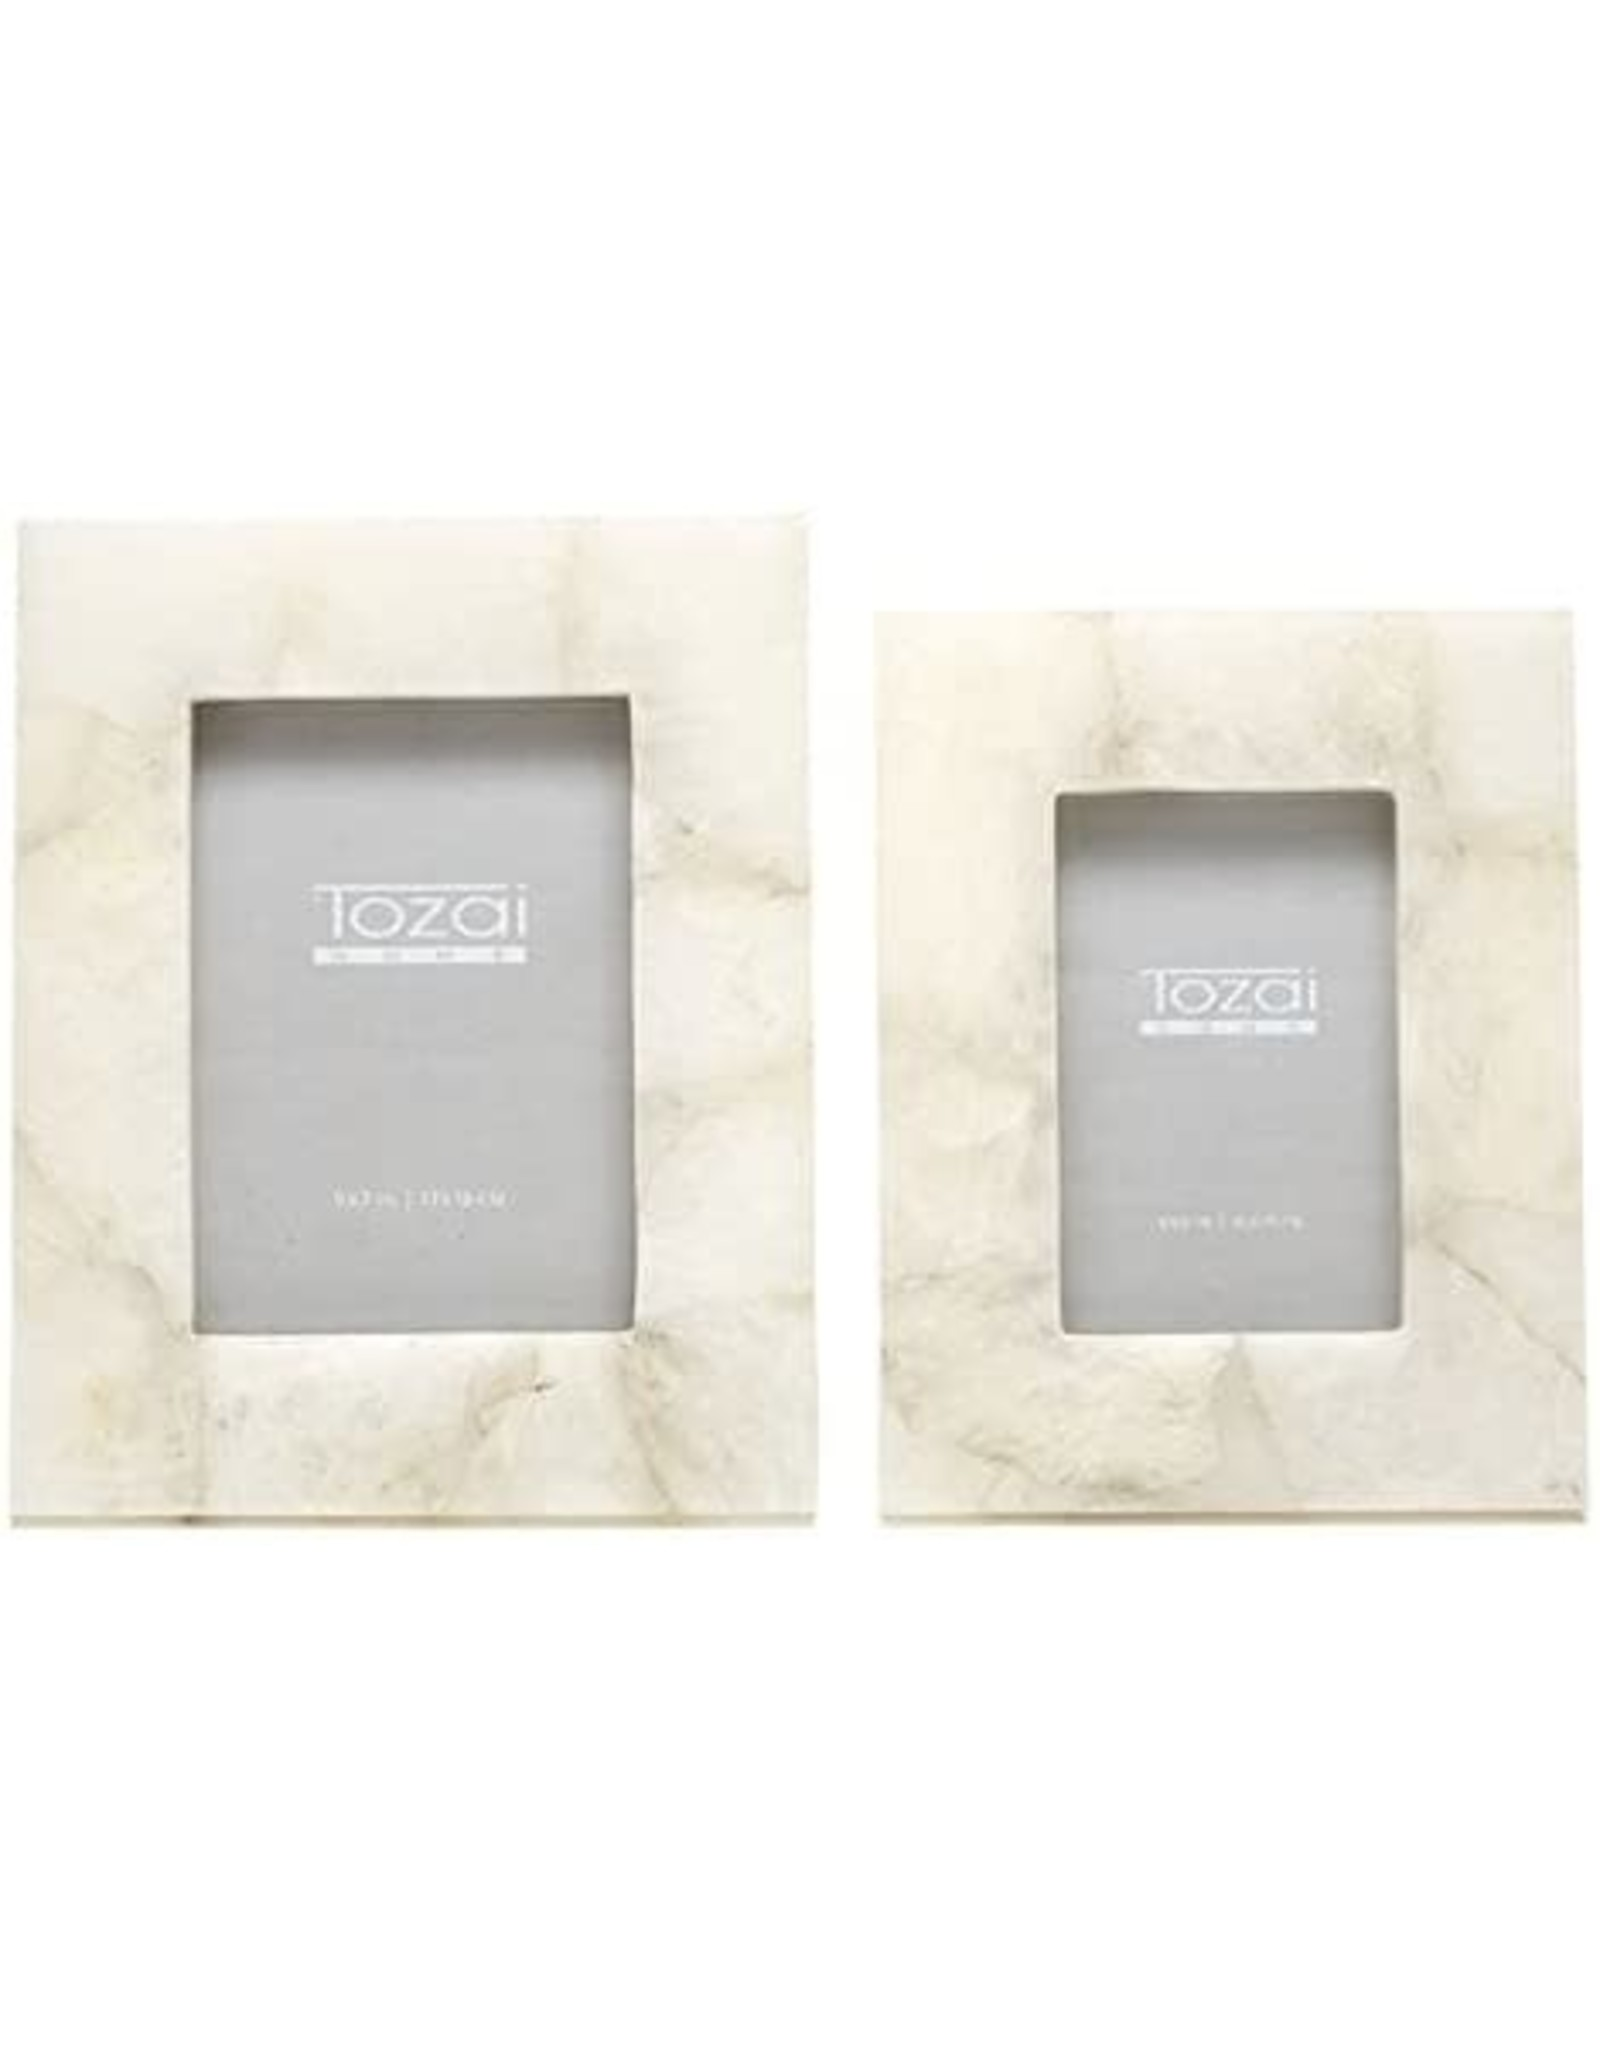 Oak + Arrow Interiors White Quartz Frame 4x6